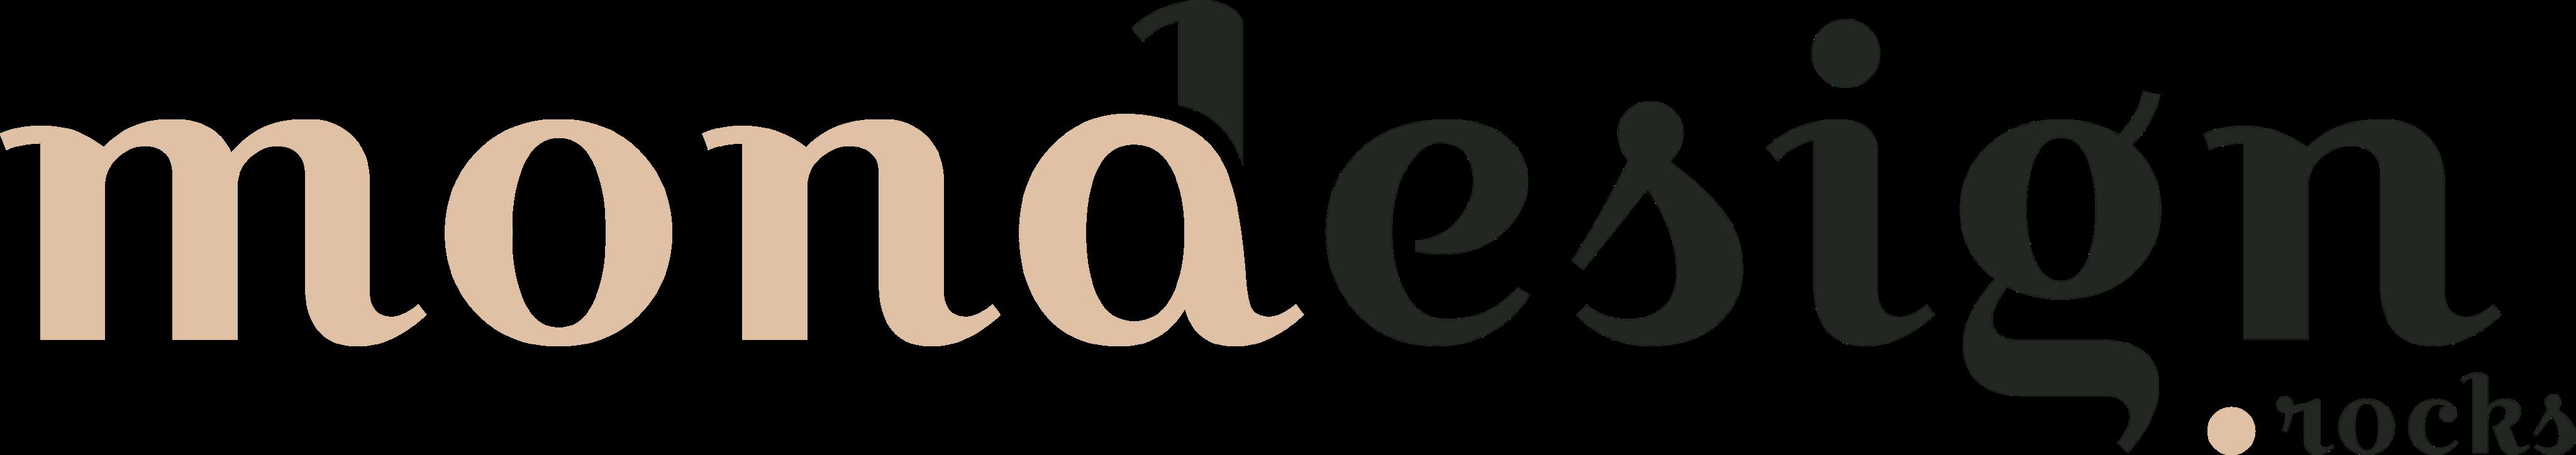 monadesign